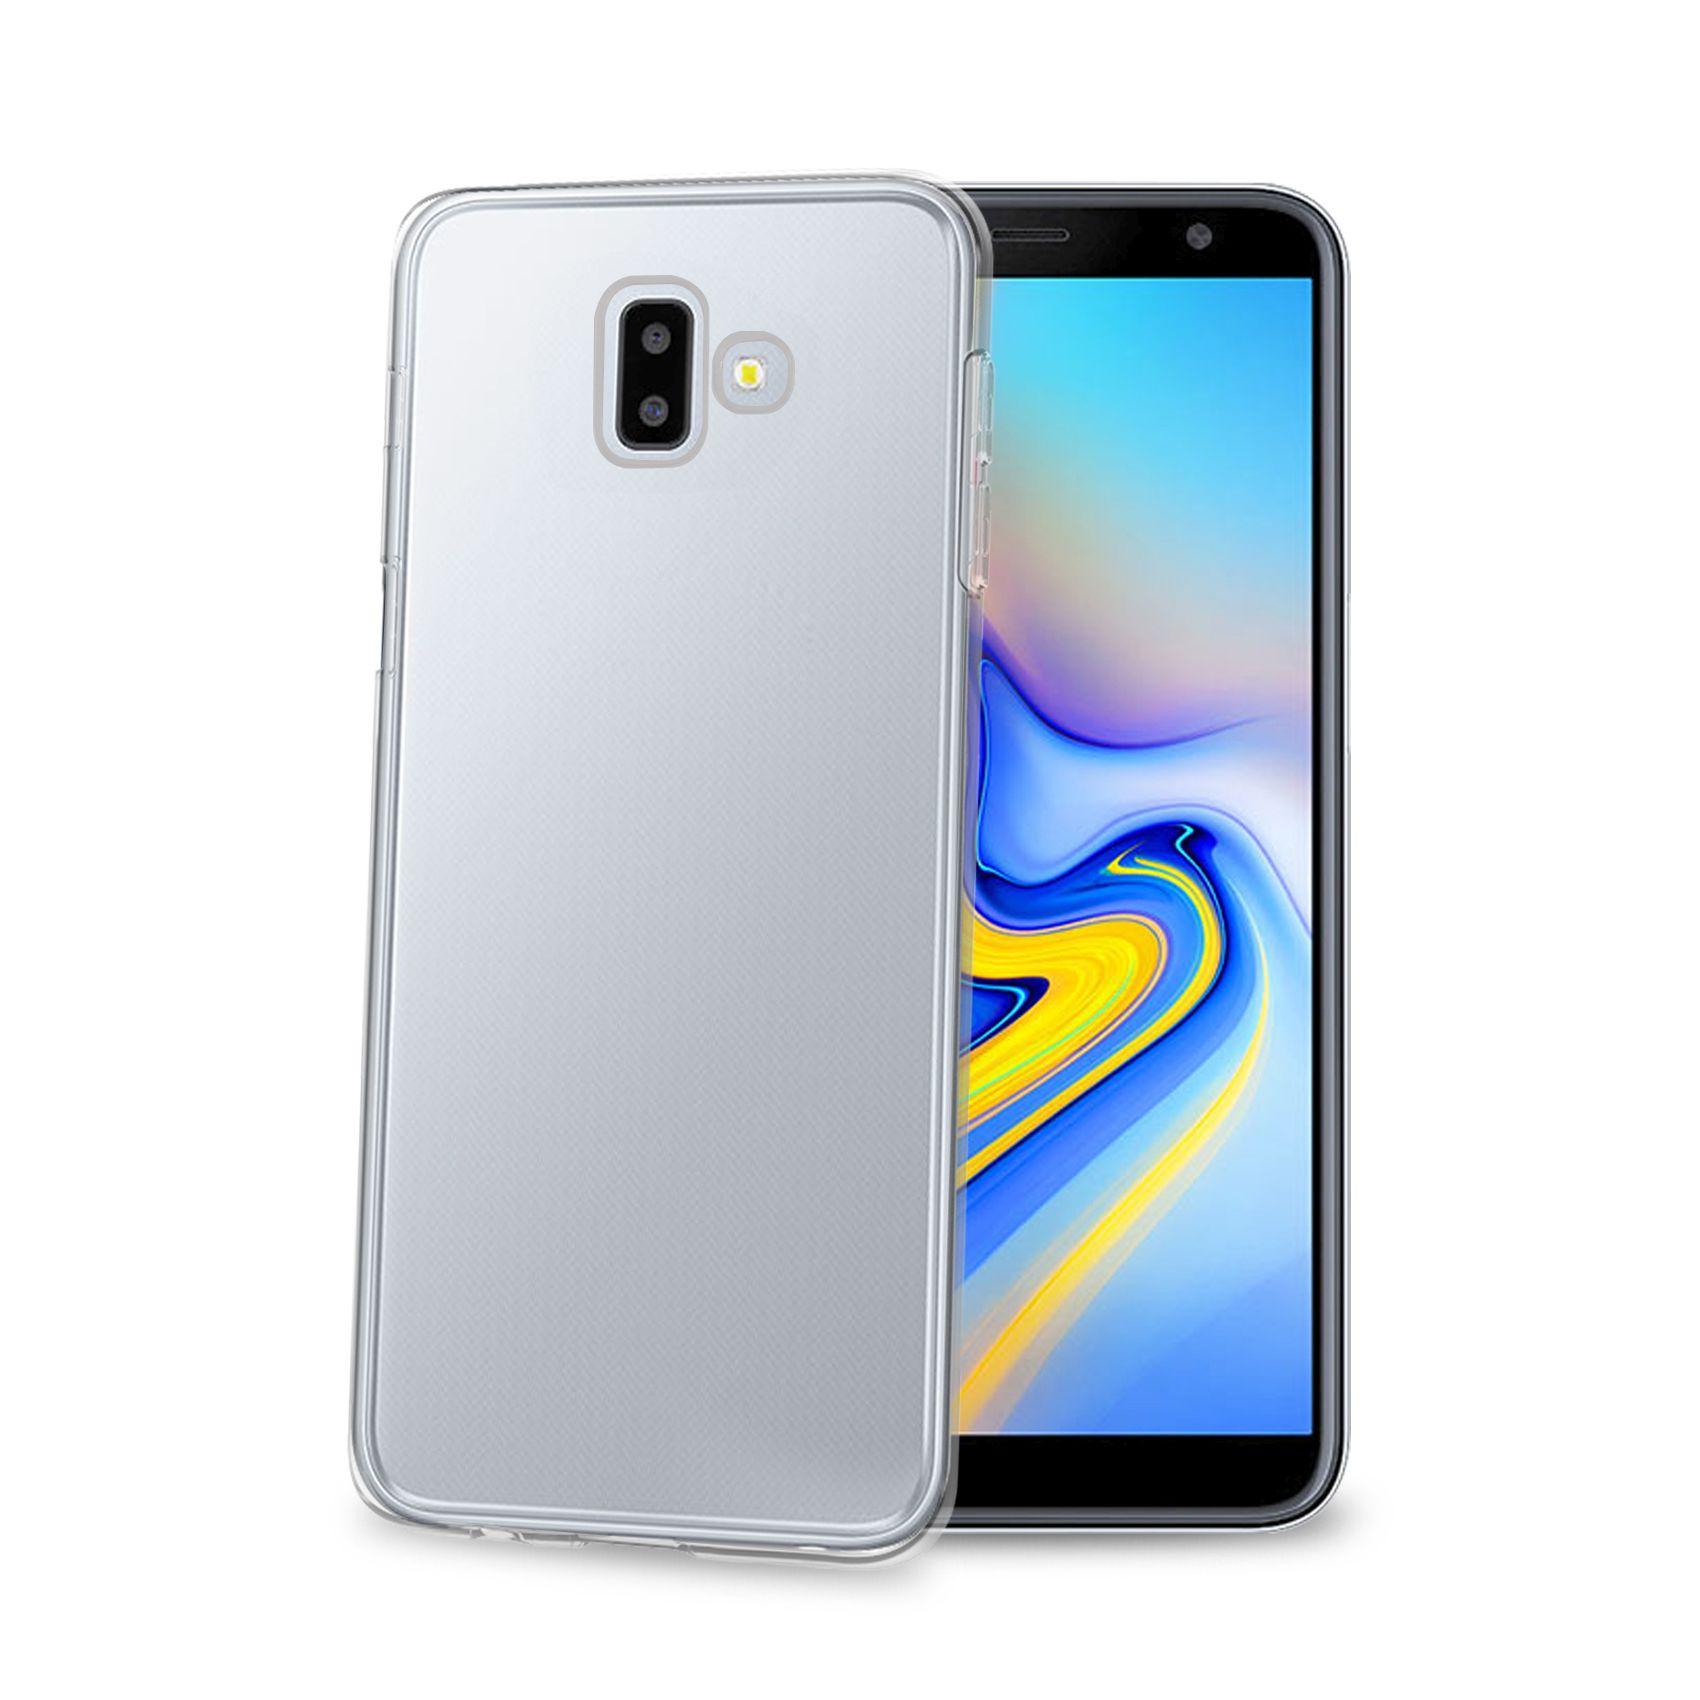 TPU pouzdro CELLY Gelskin pro Samsung Galaxy J6+ (2018), bezbarvé